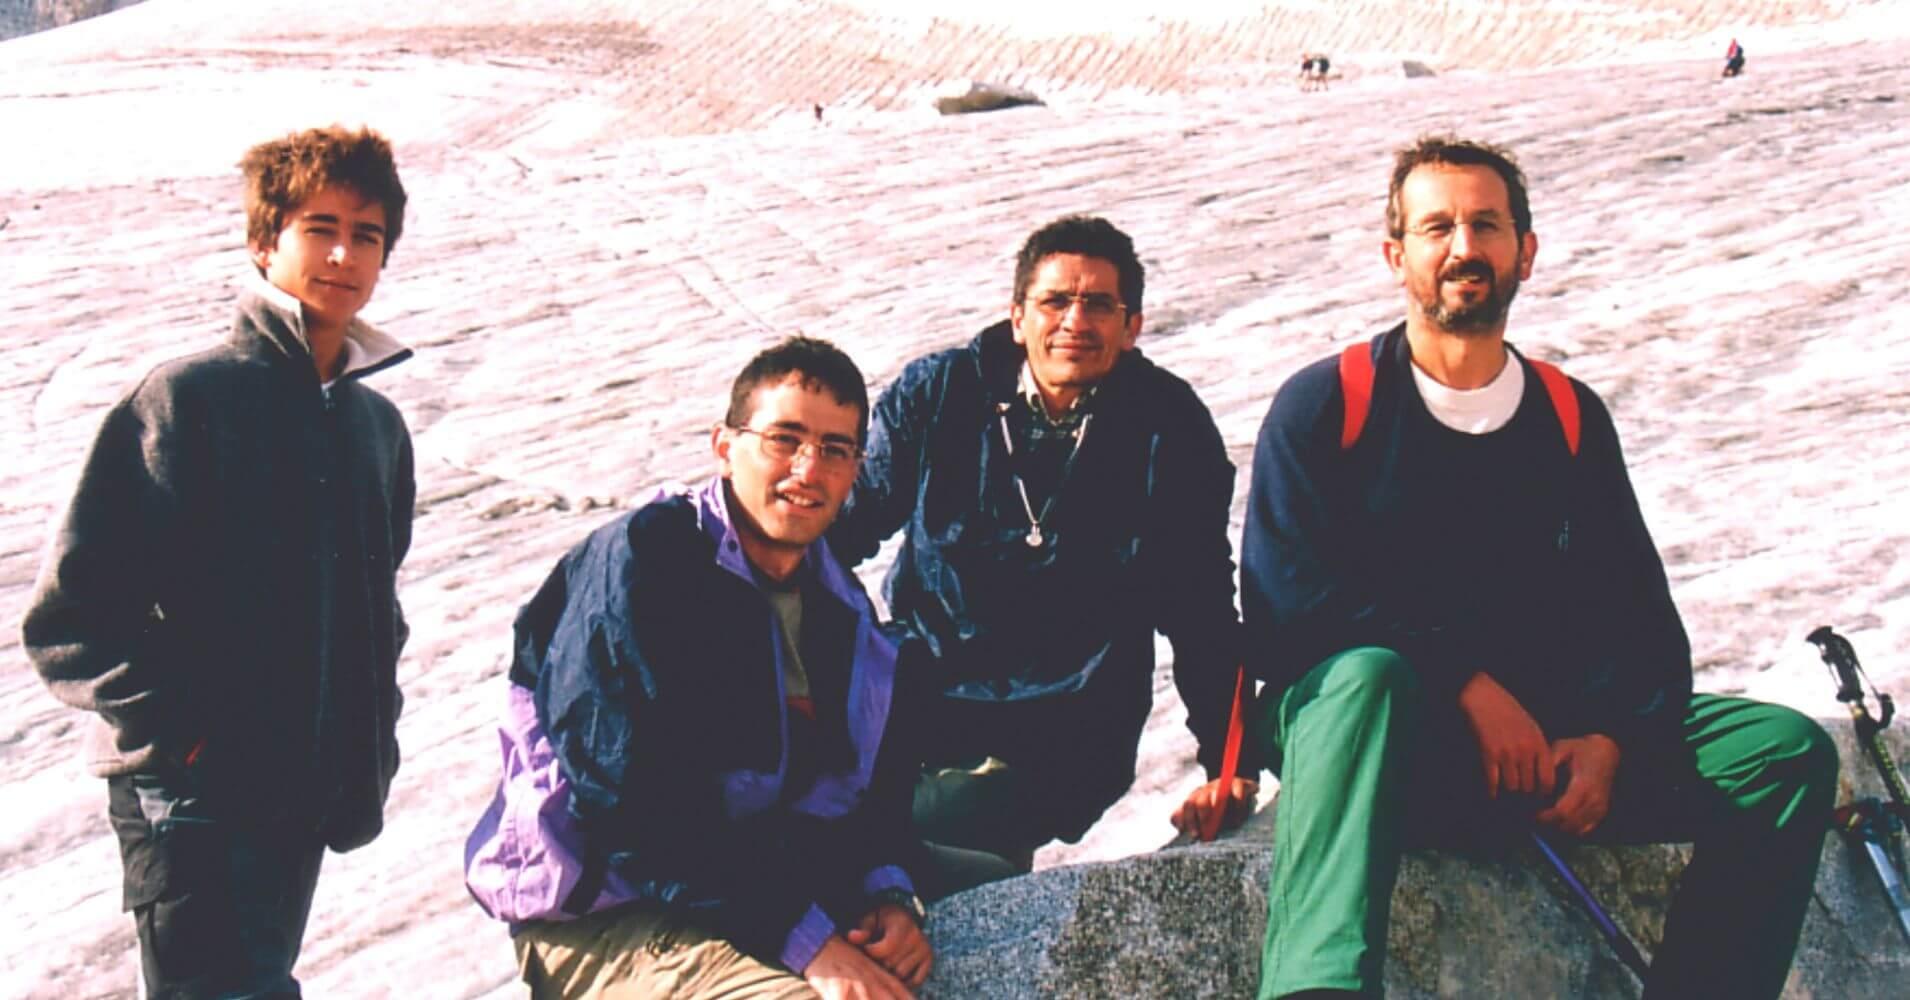 Componentes del Grupo Camino de la Cumbre del Pico Aneto. Benasque. Huesca, Aragón.